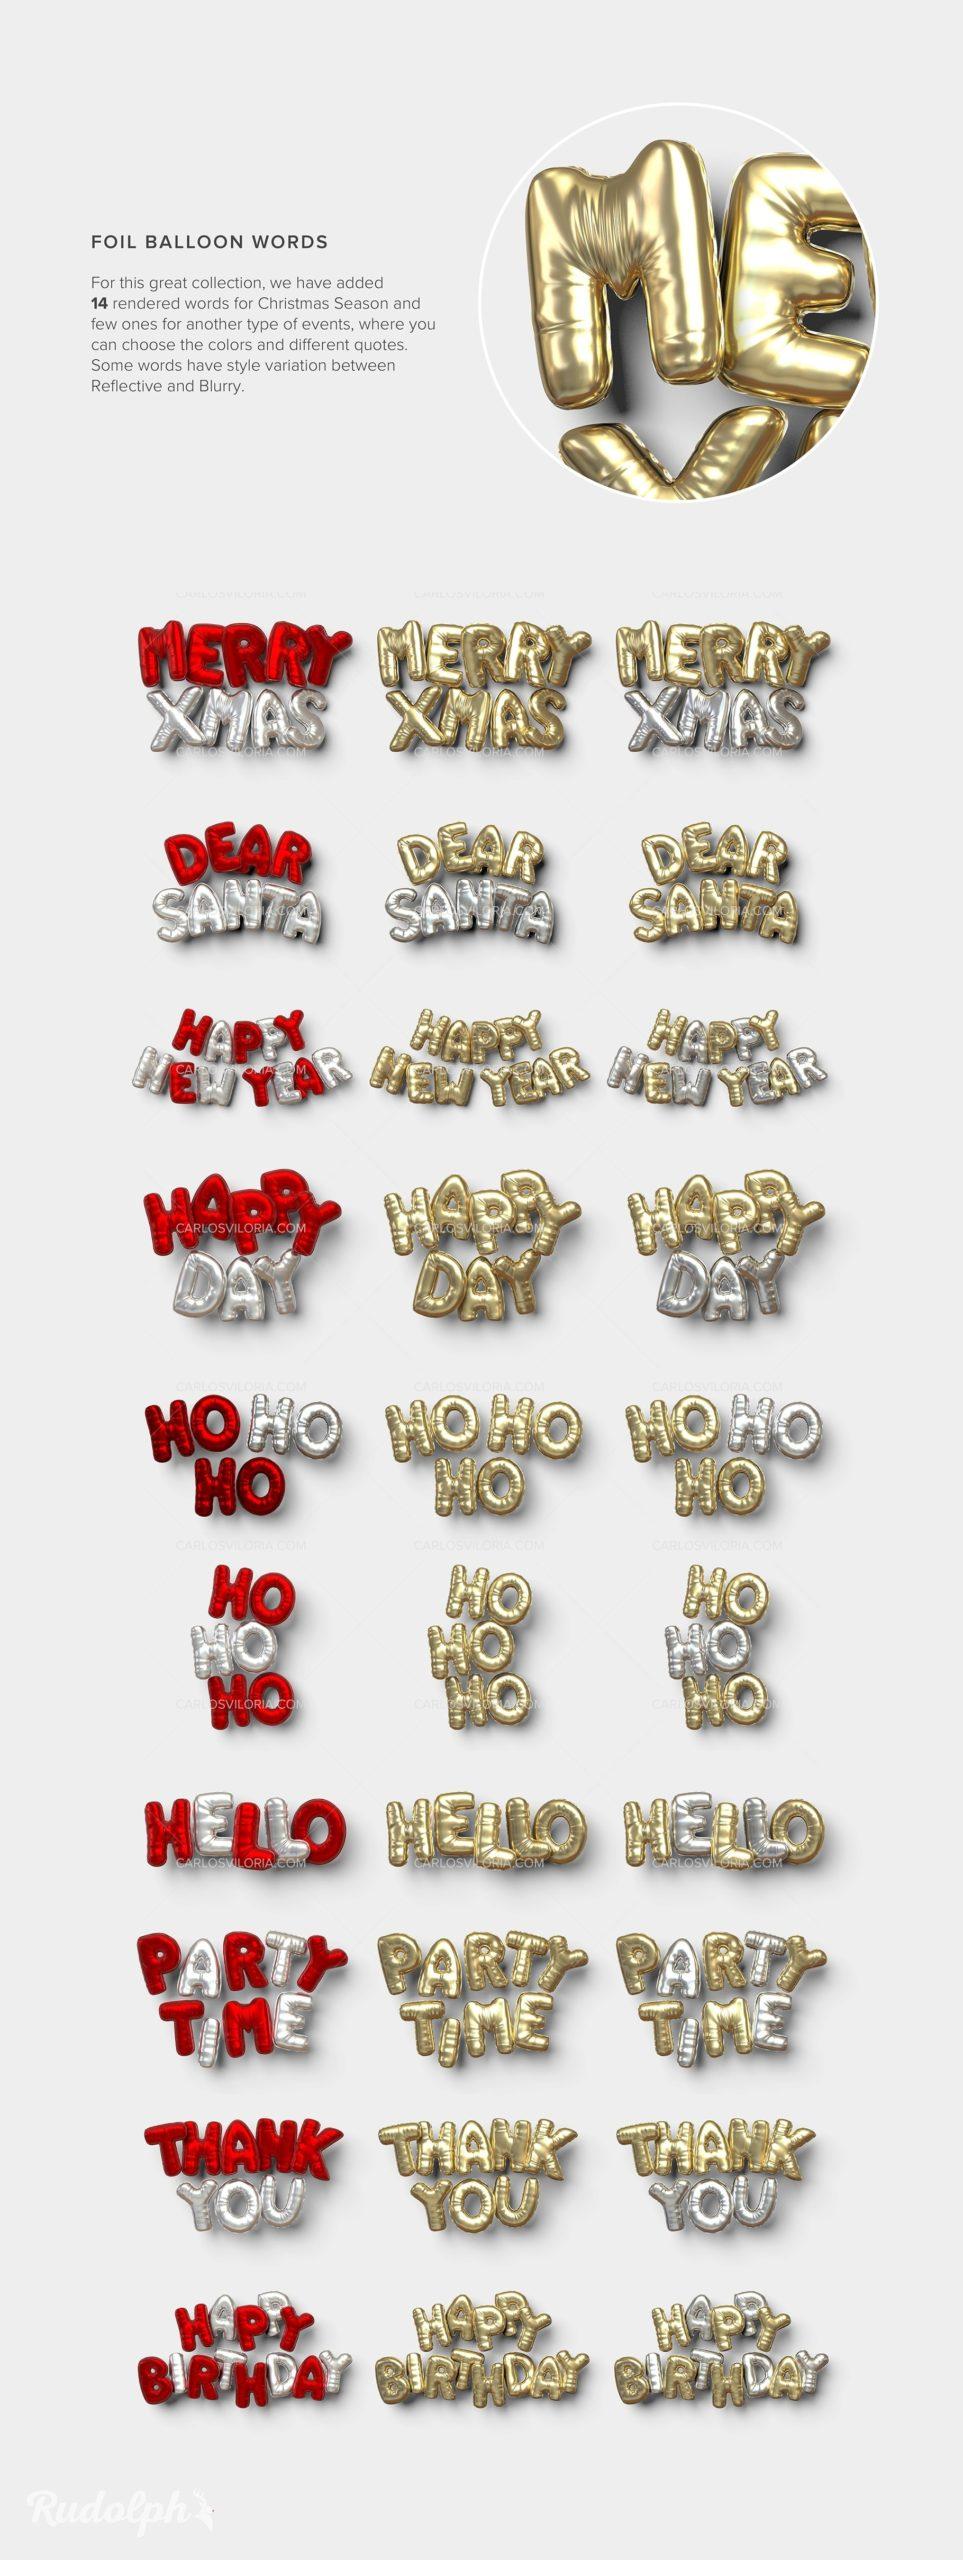 Rudolph 3D Foil Balloons Words